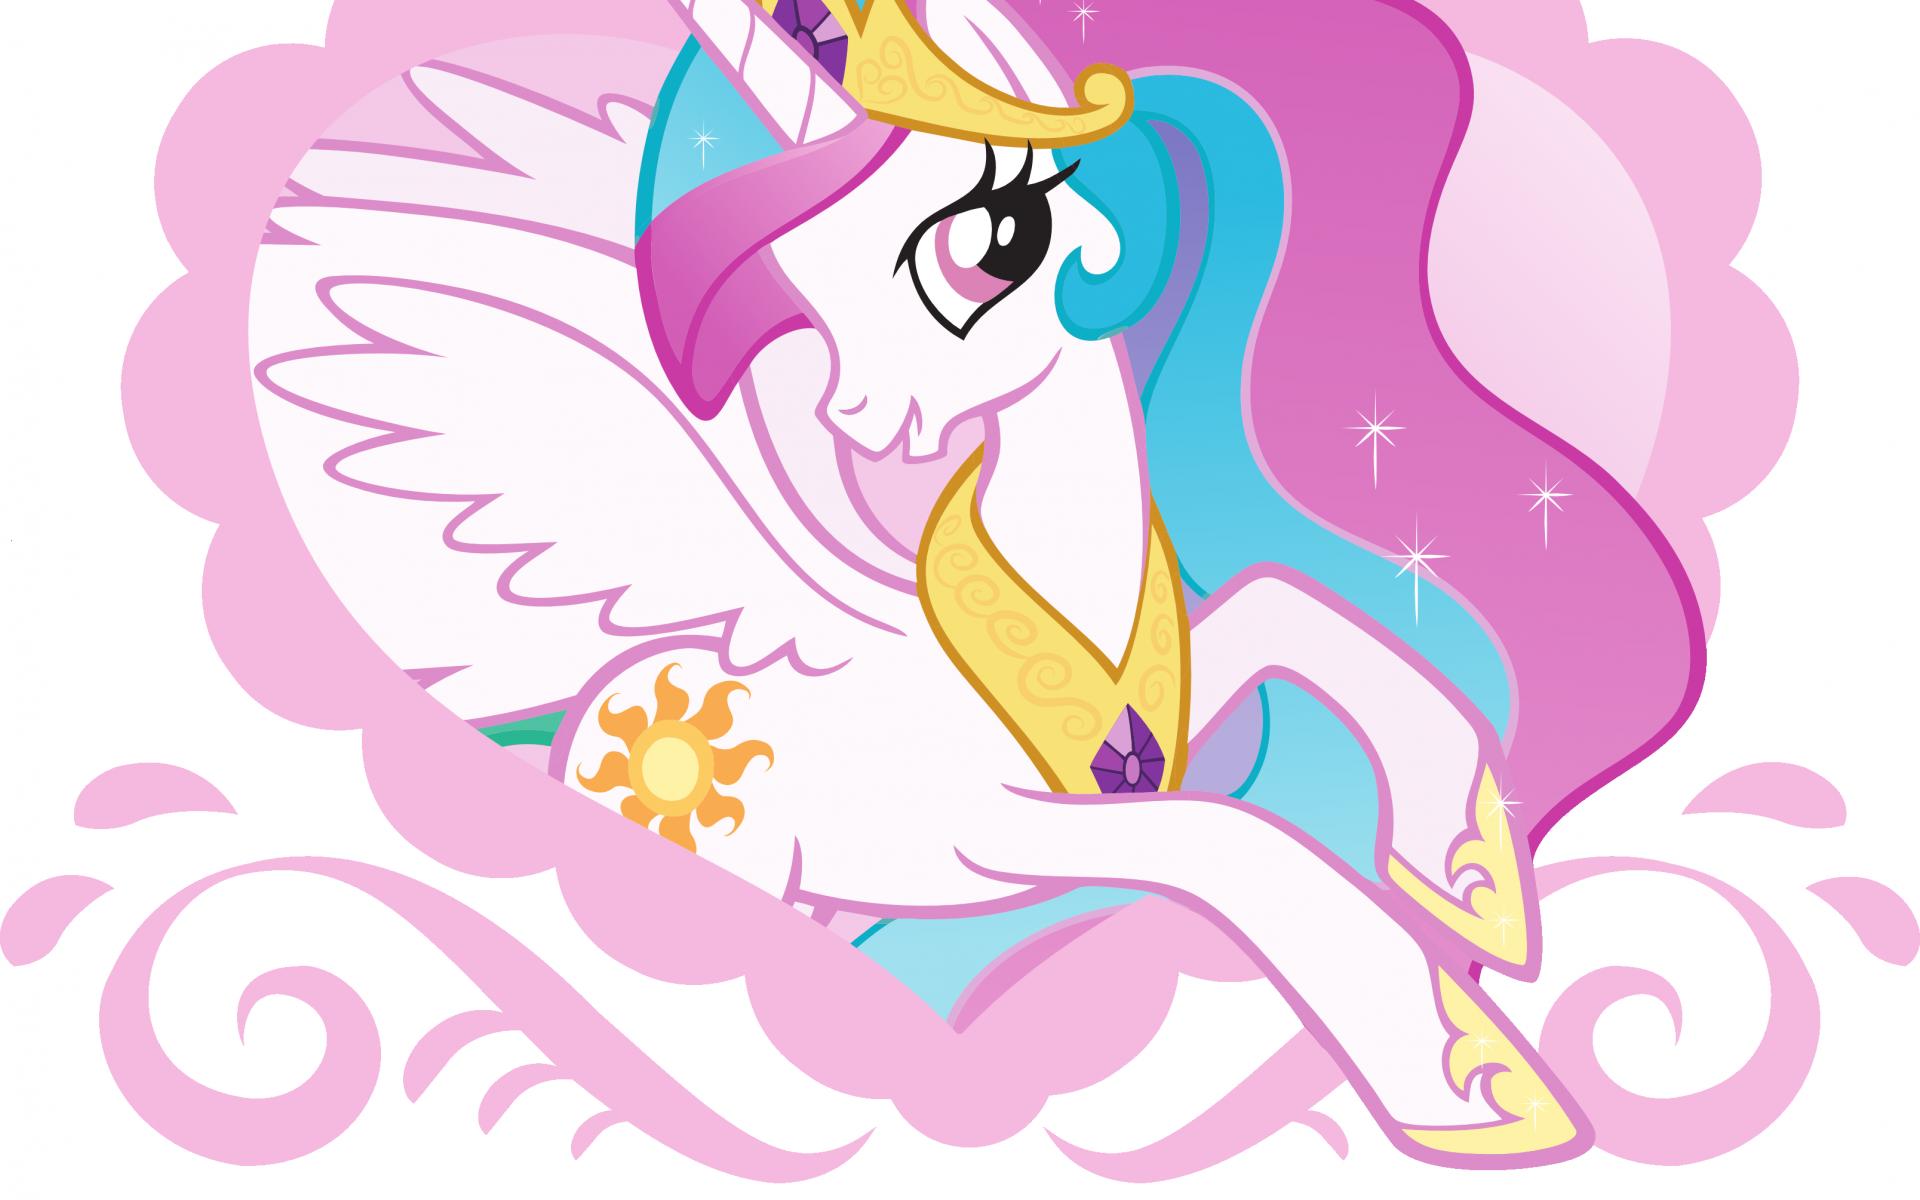 My Little Pony Wallpaper Celestia 3597 Full Hd Wallpaper Desktop My Little Pony Princess My Little Pony Wallpaper My Little Pony Bedroom